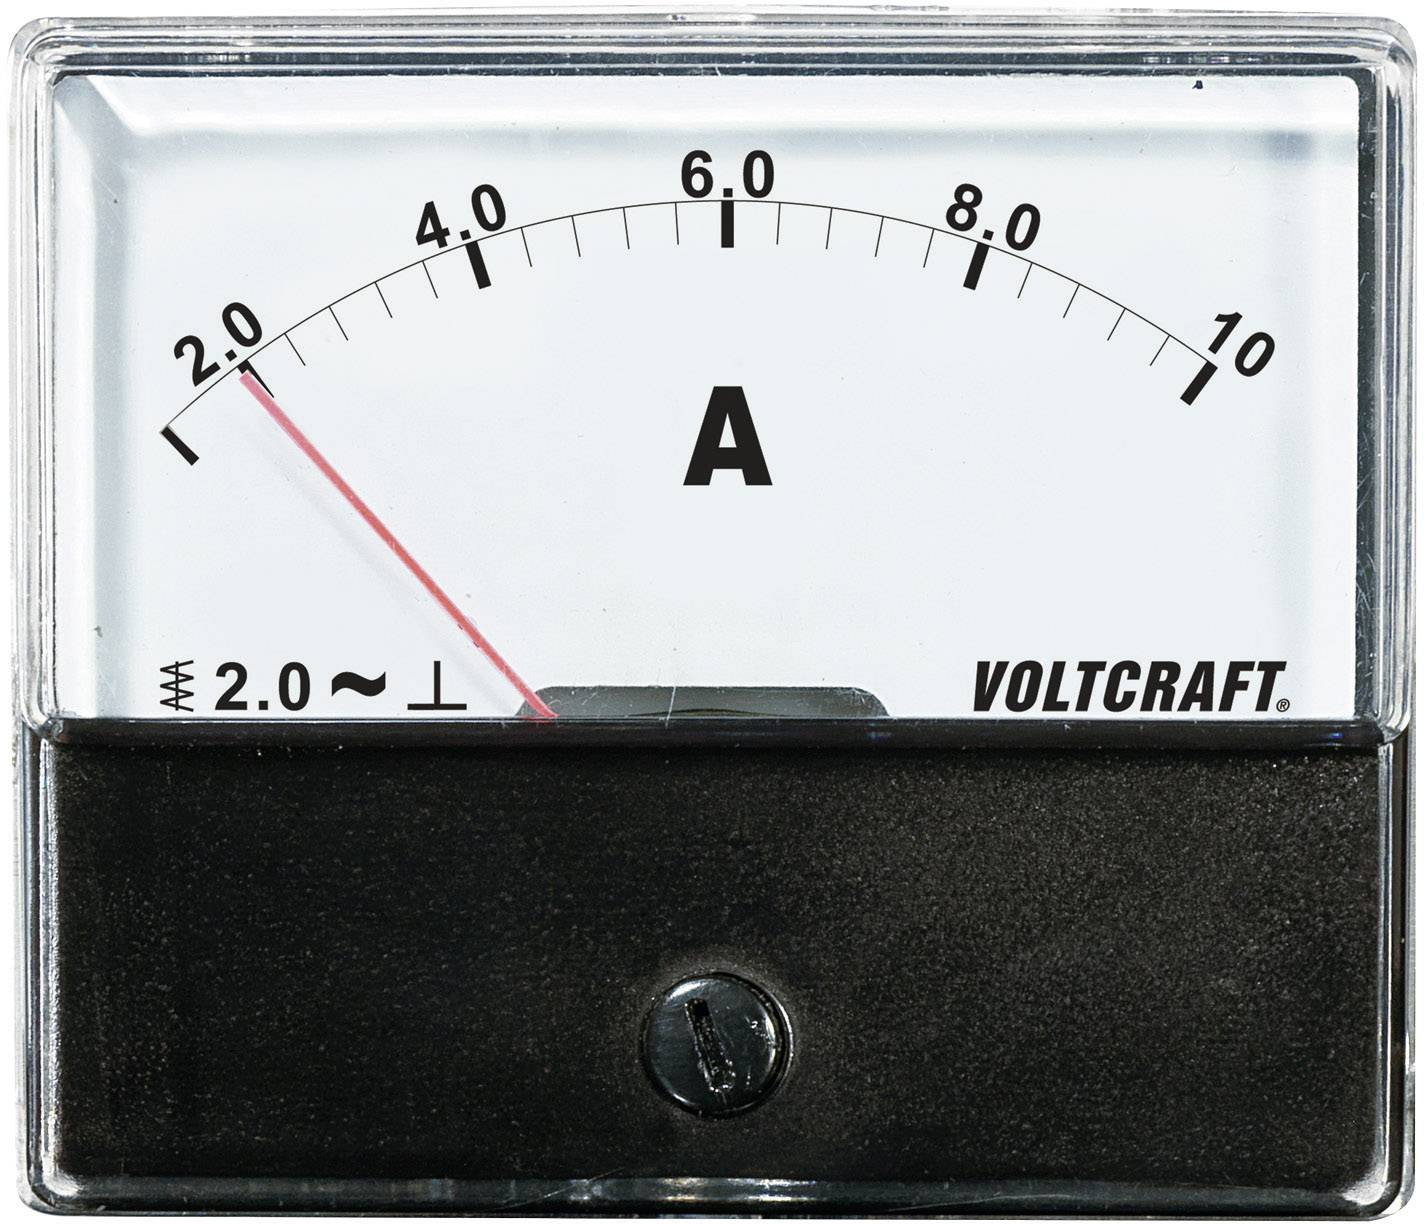 VOLTCRAFT AM-70X60/10A Ugradbeni mjerni uređaj AM  10 A pomično željezo